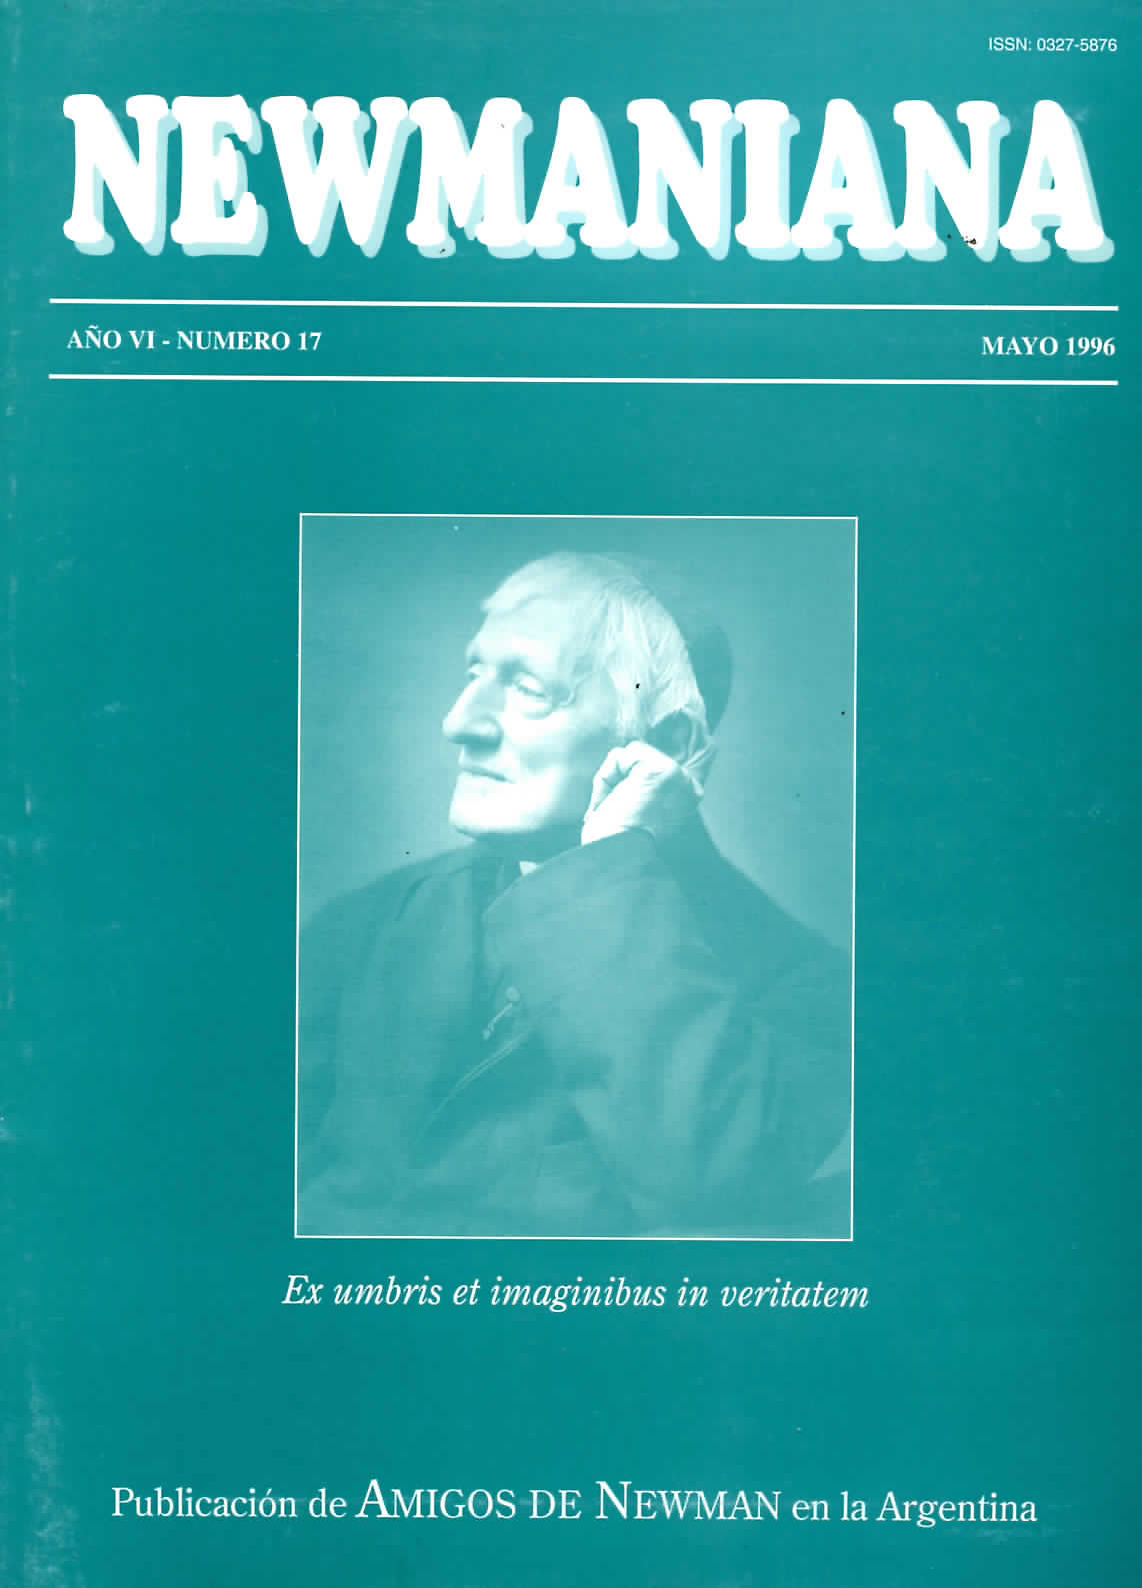 Revista Newmaniana Nº 17 -Mayo 1996